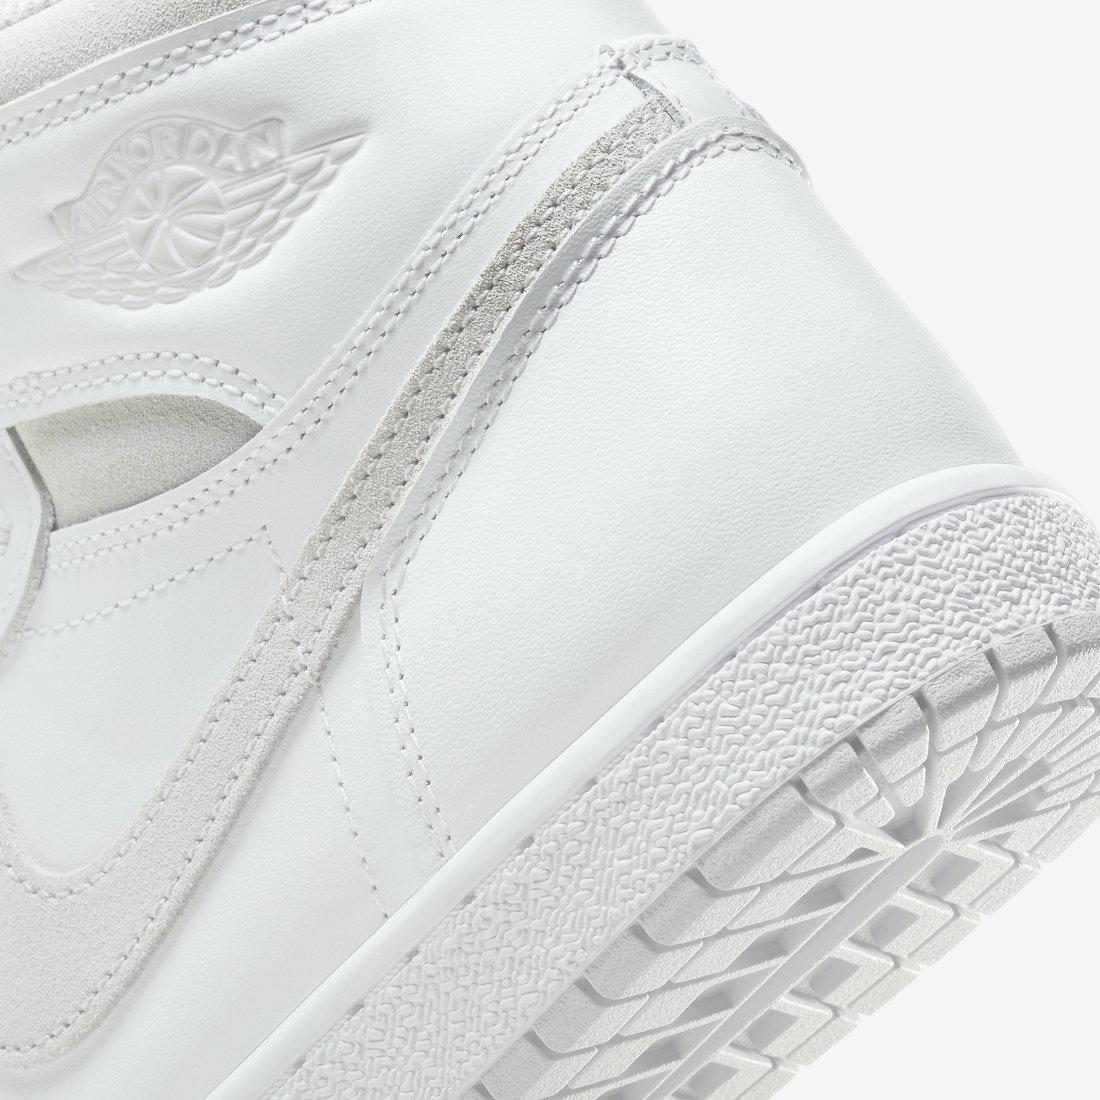 Air Jordan 1 High 85 Neutral Grey BQ4422-100 Release Date Price